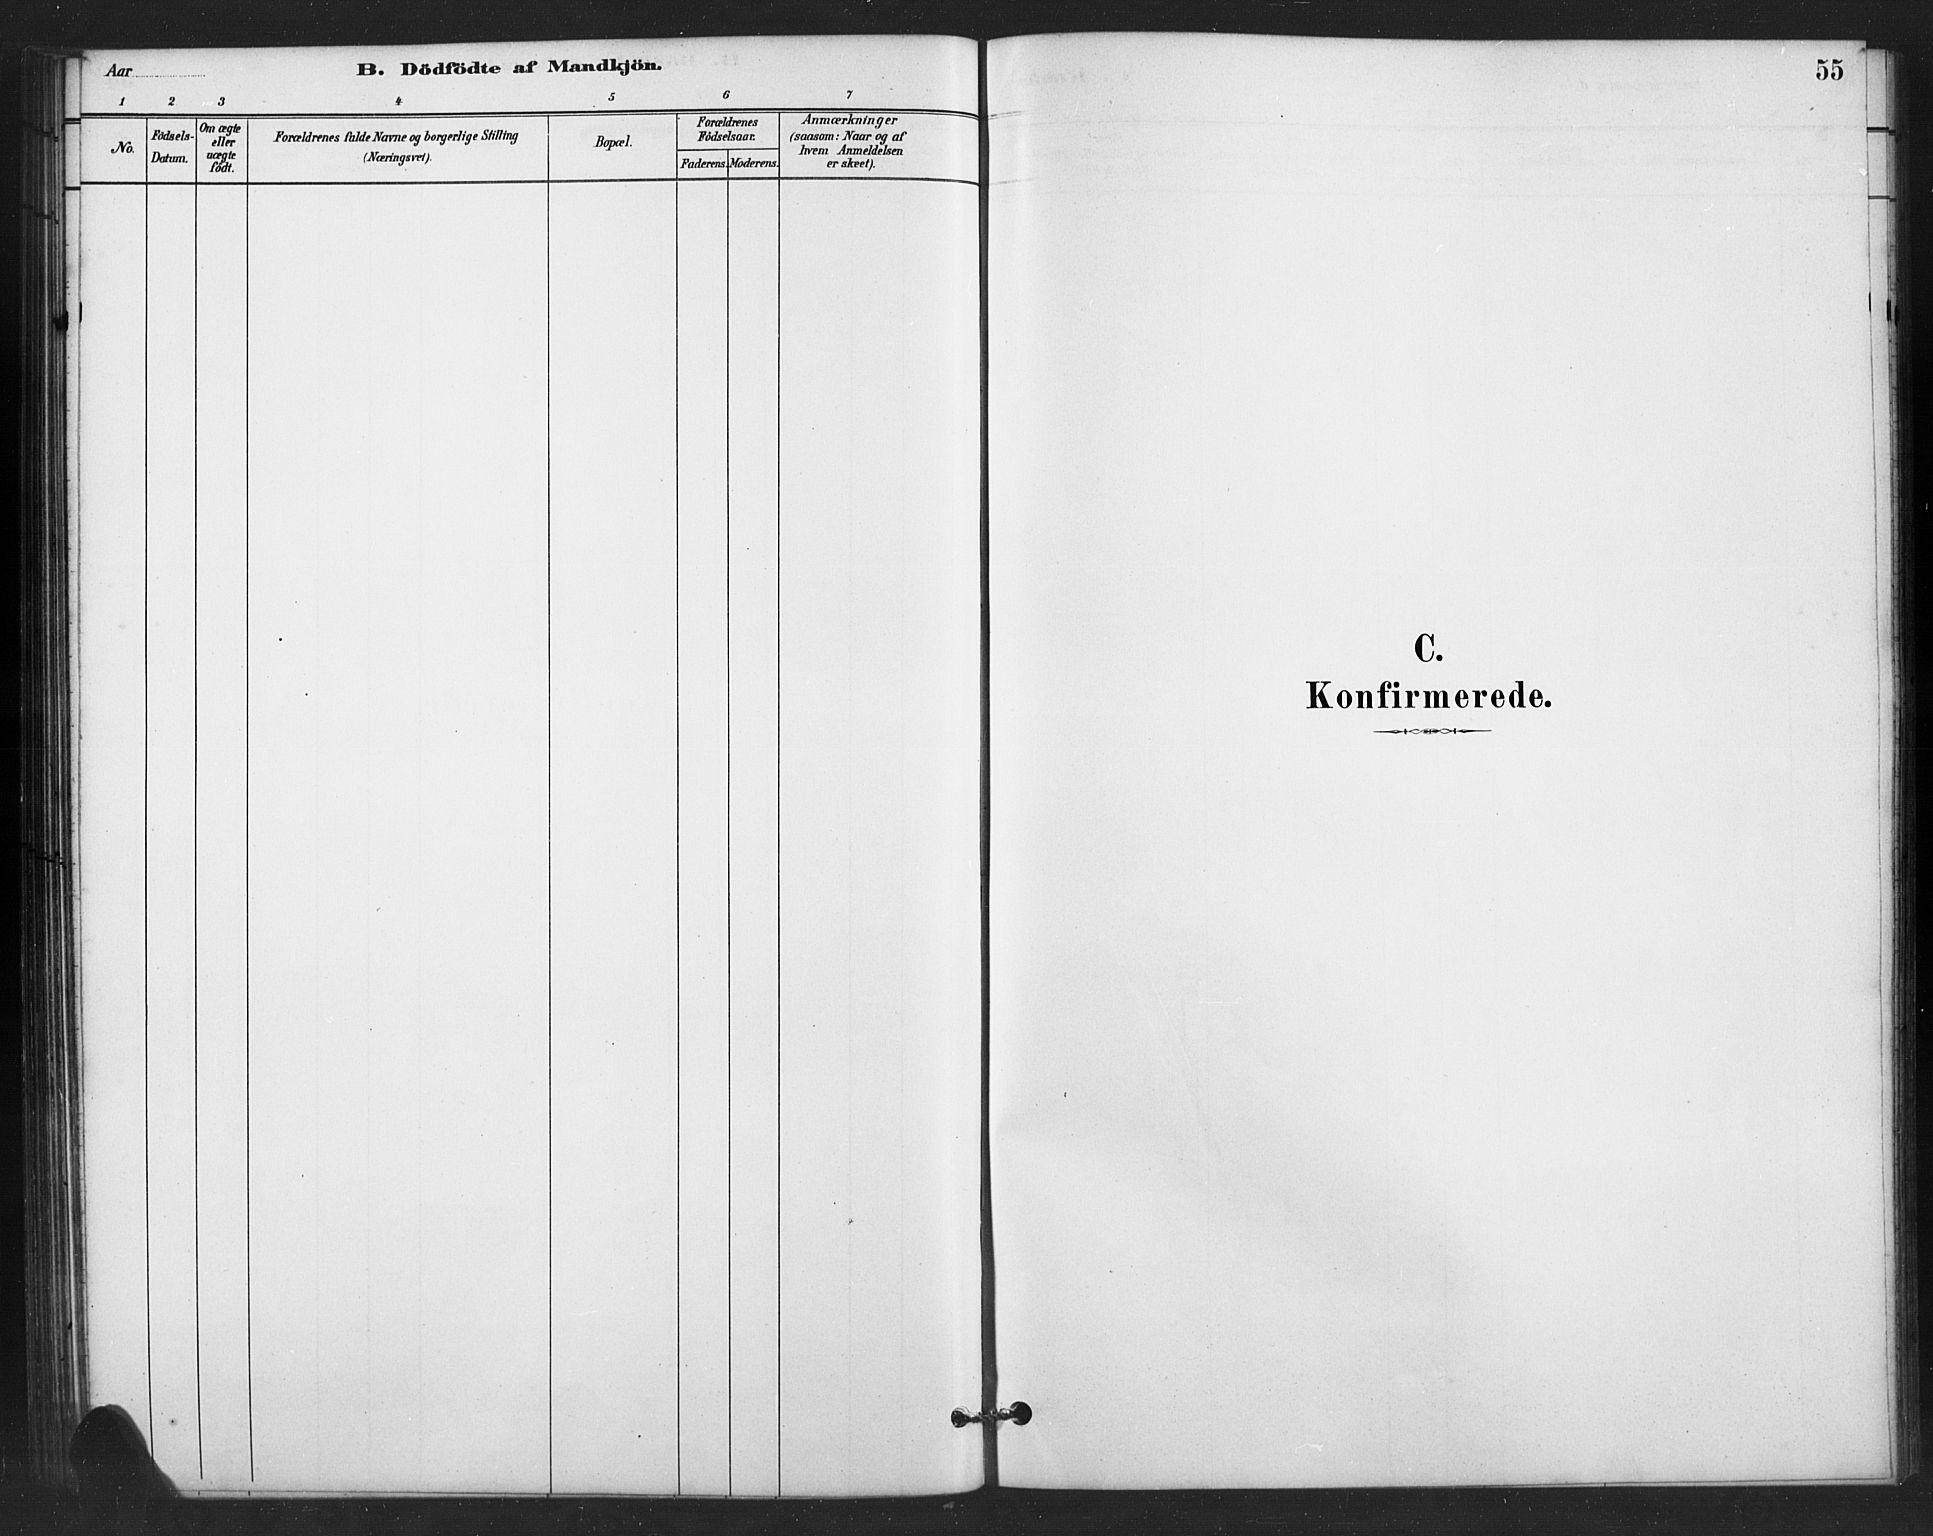 SAH, Vestre Slidre prestekontor, Klokkerbok nr. 6, 1881-1915, s. 55